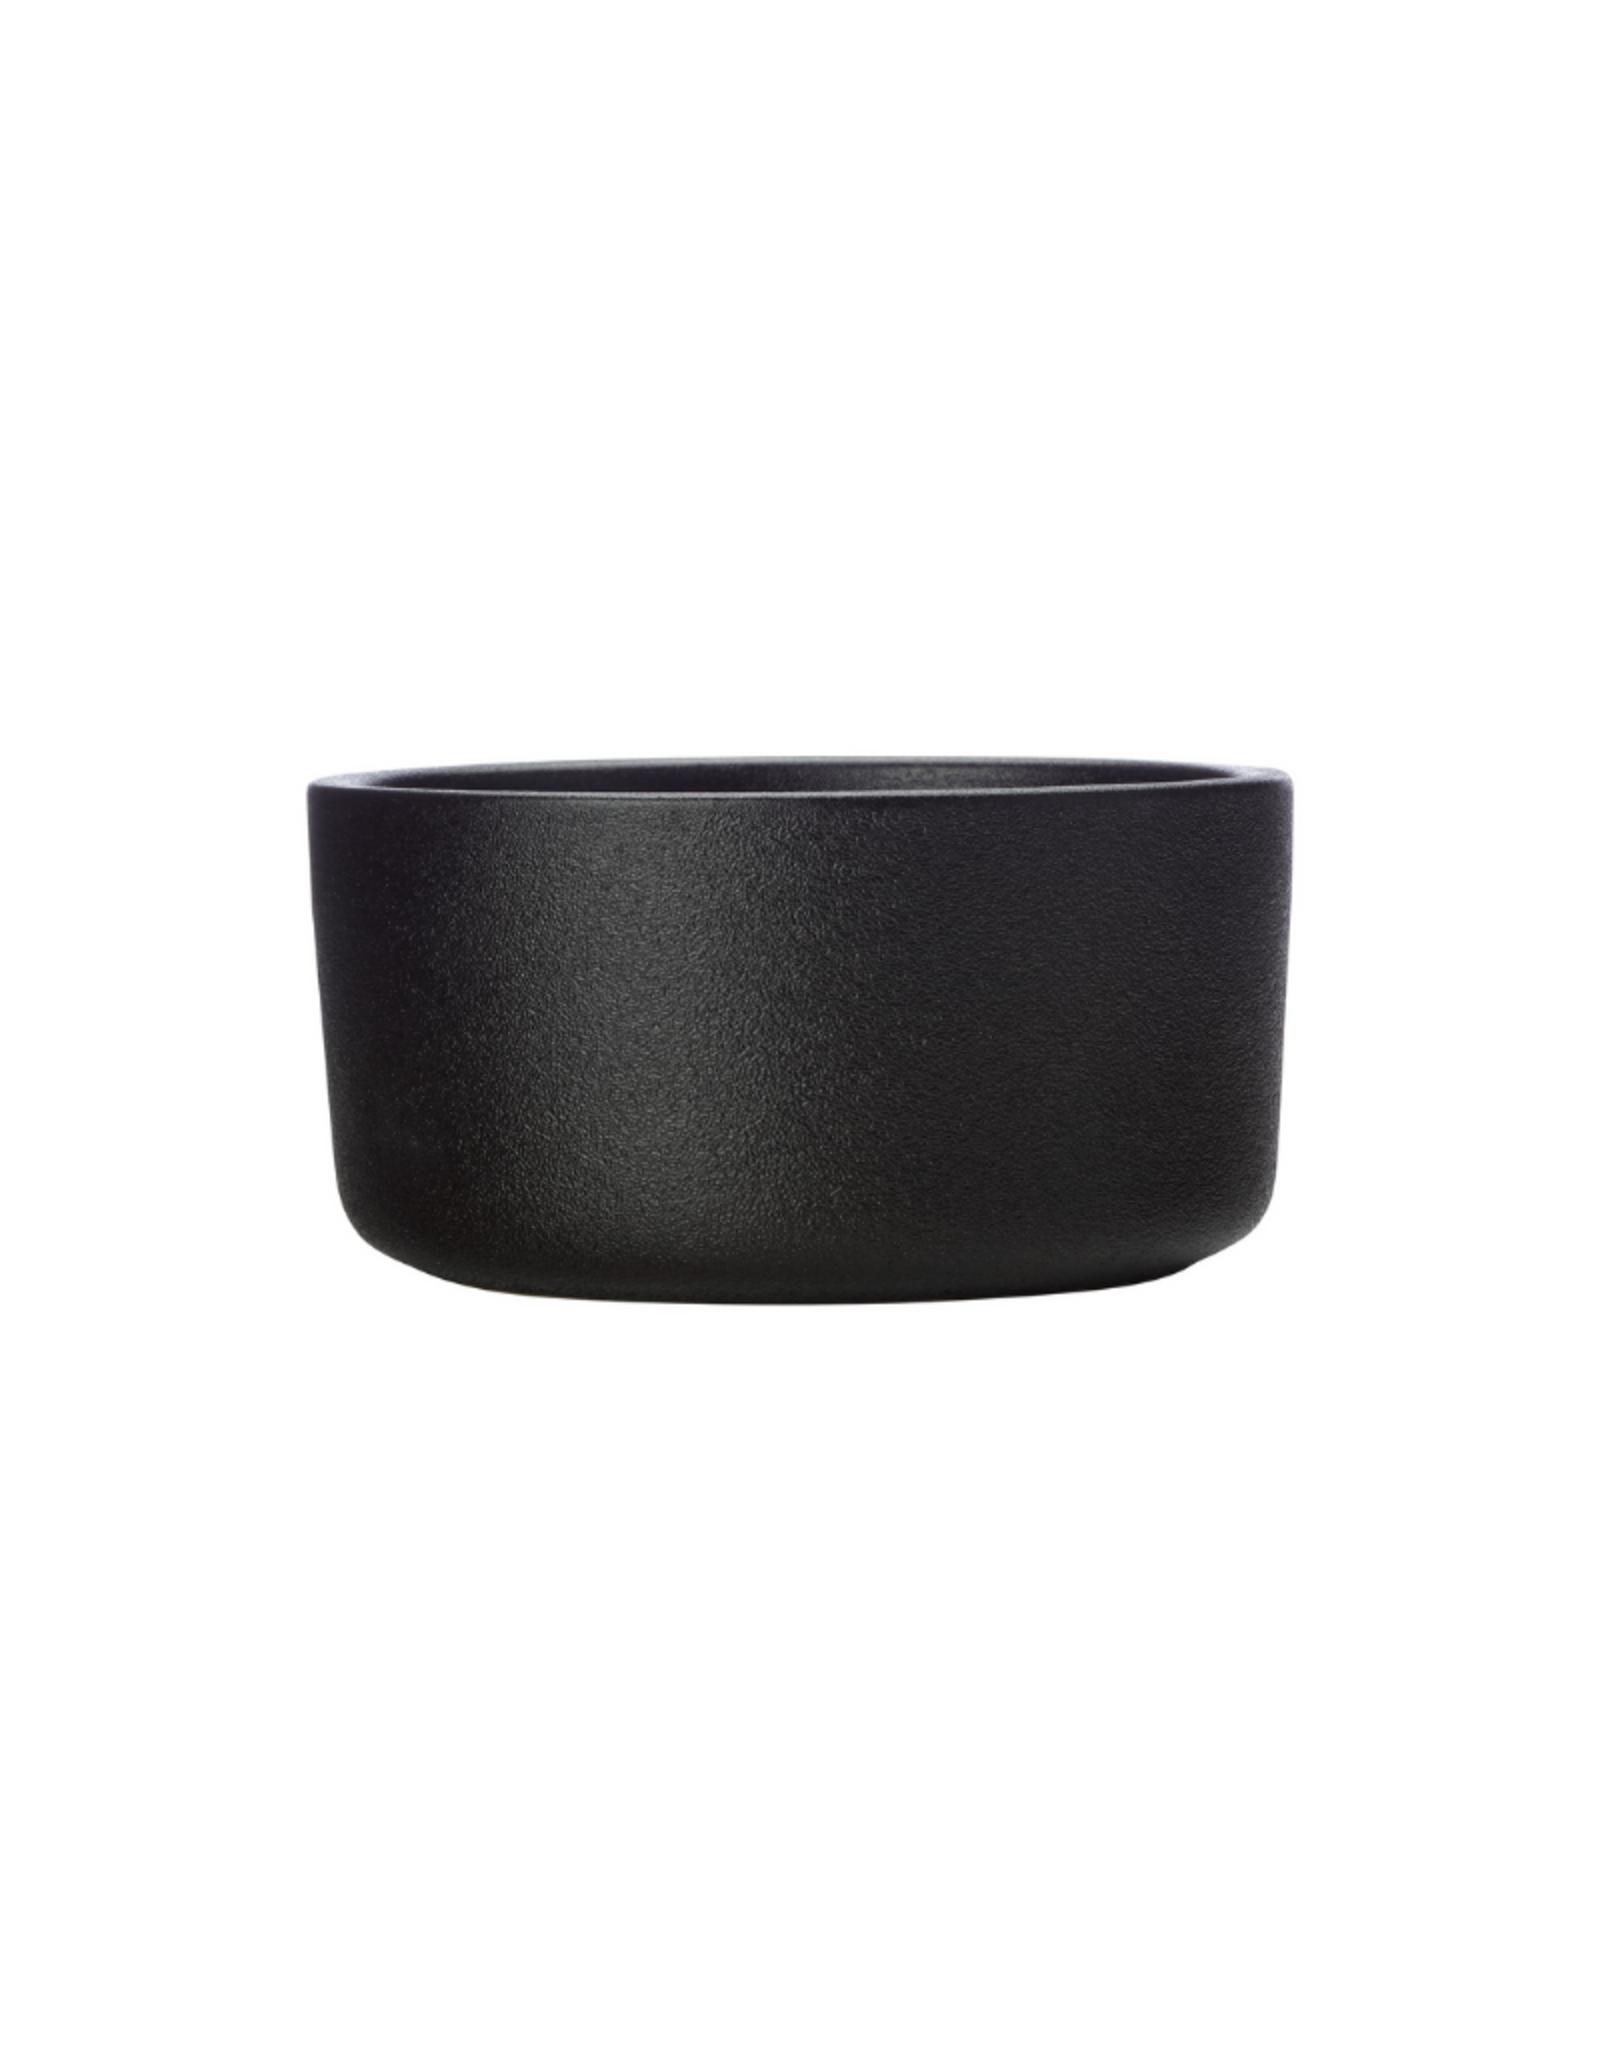 Maxwell Williams Ramequin Caviar 8.5 x 4cm